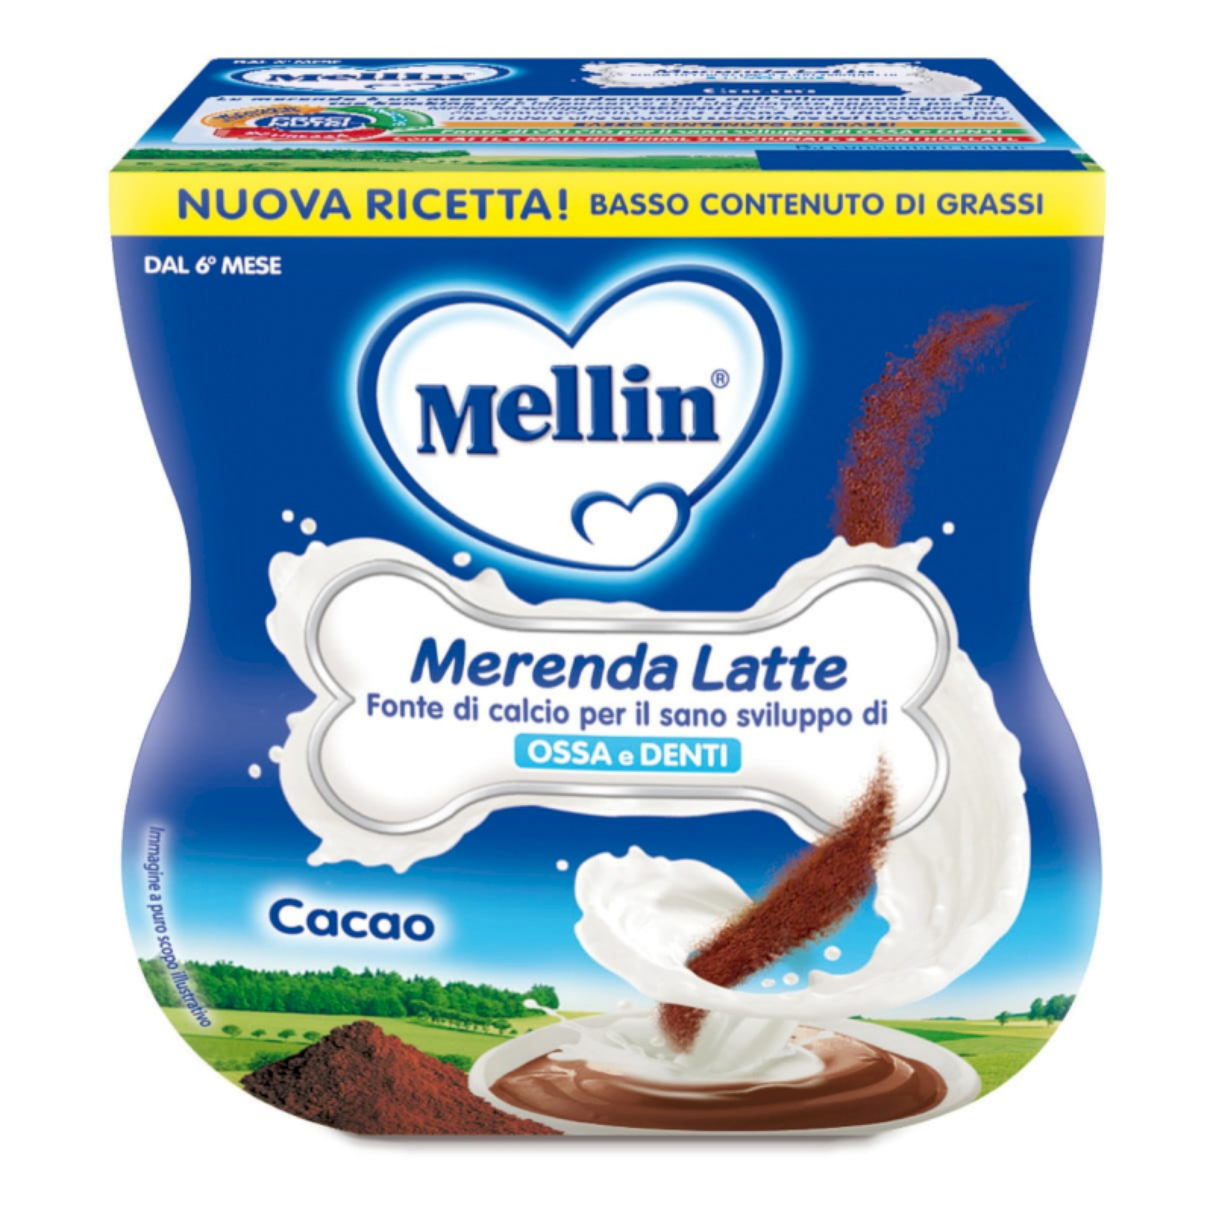 Merenda Latte e Cacao Mellin